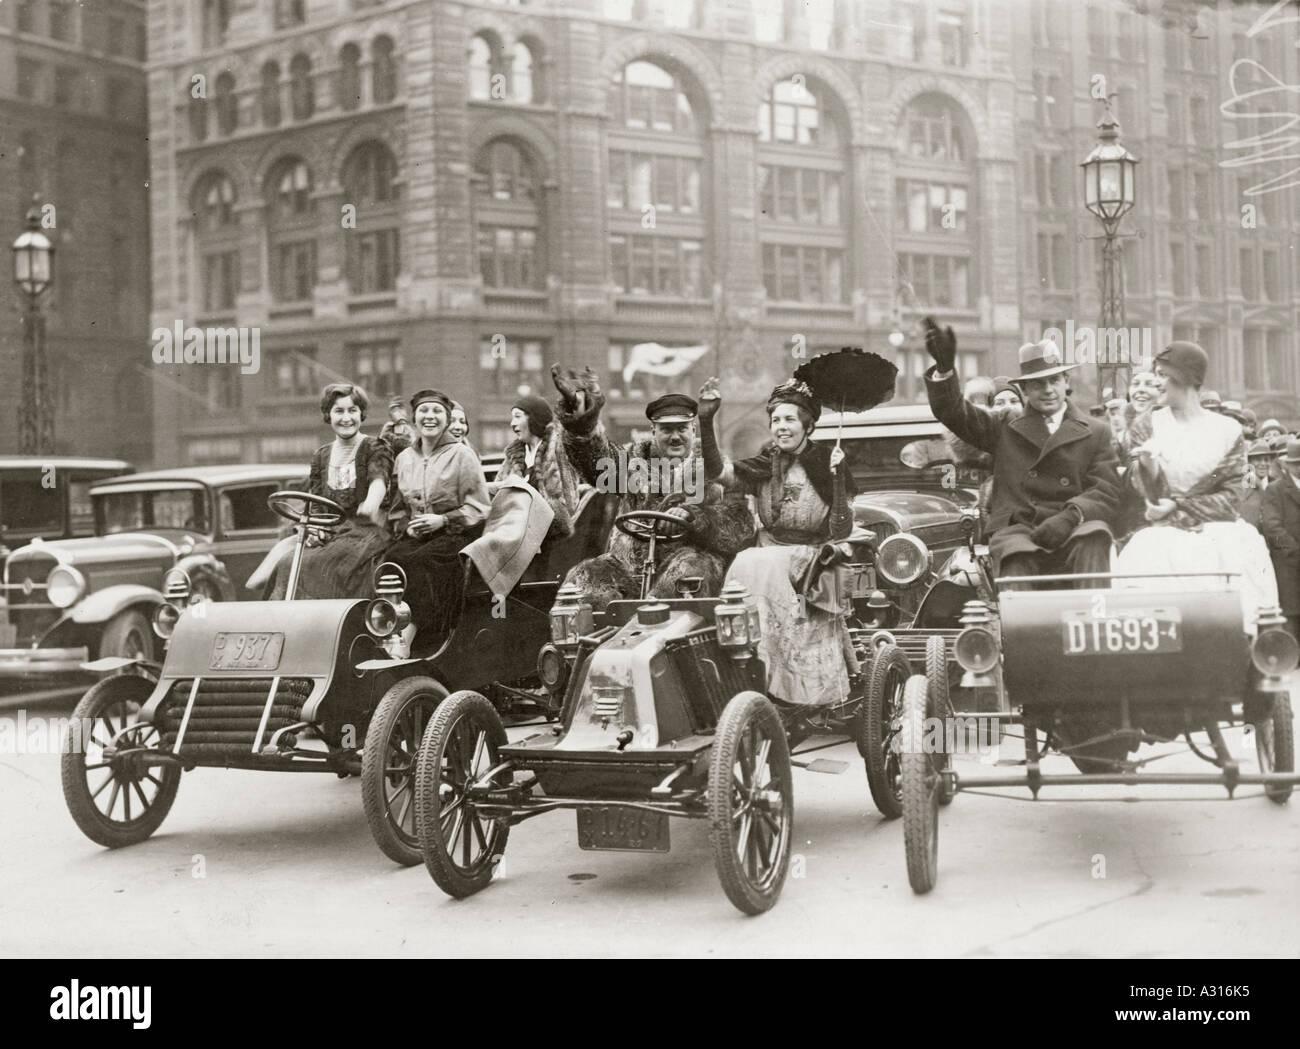 London Brighton Vintage Car Run Stock Photos & London Brighton ...